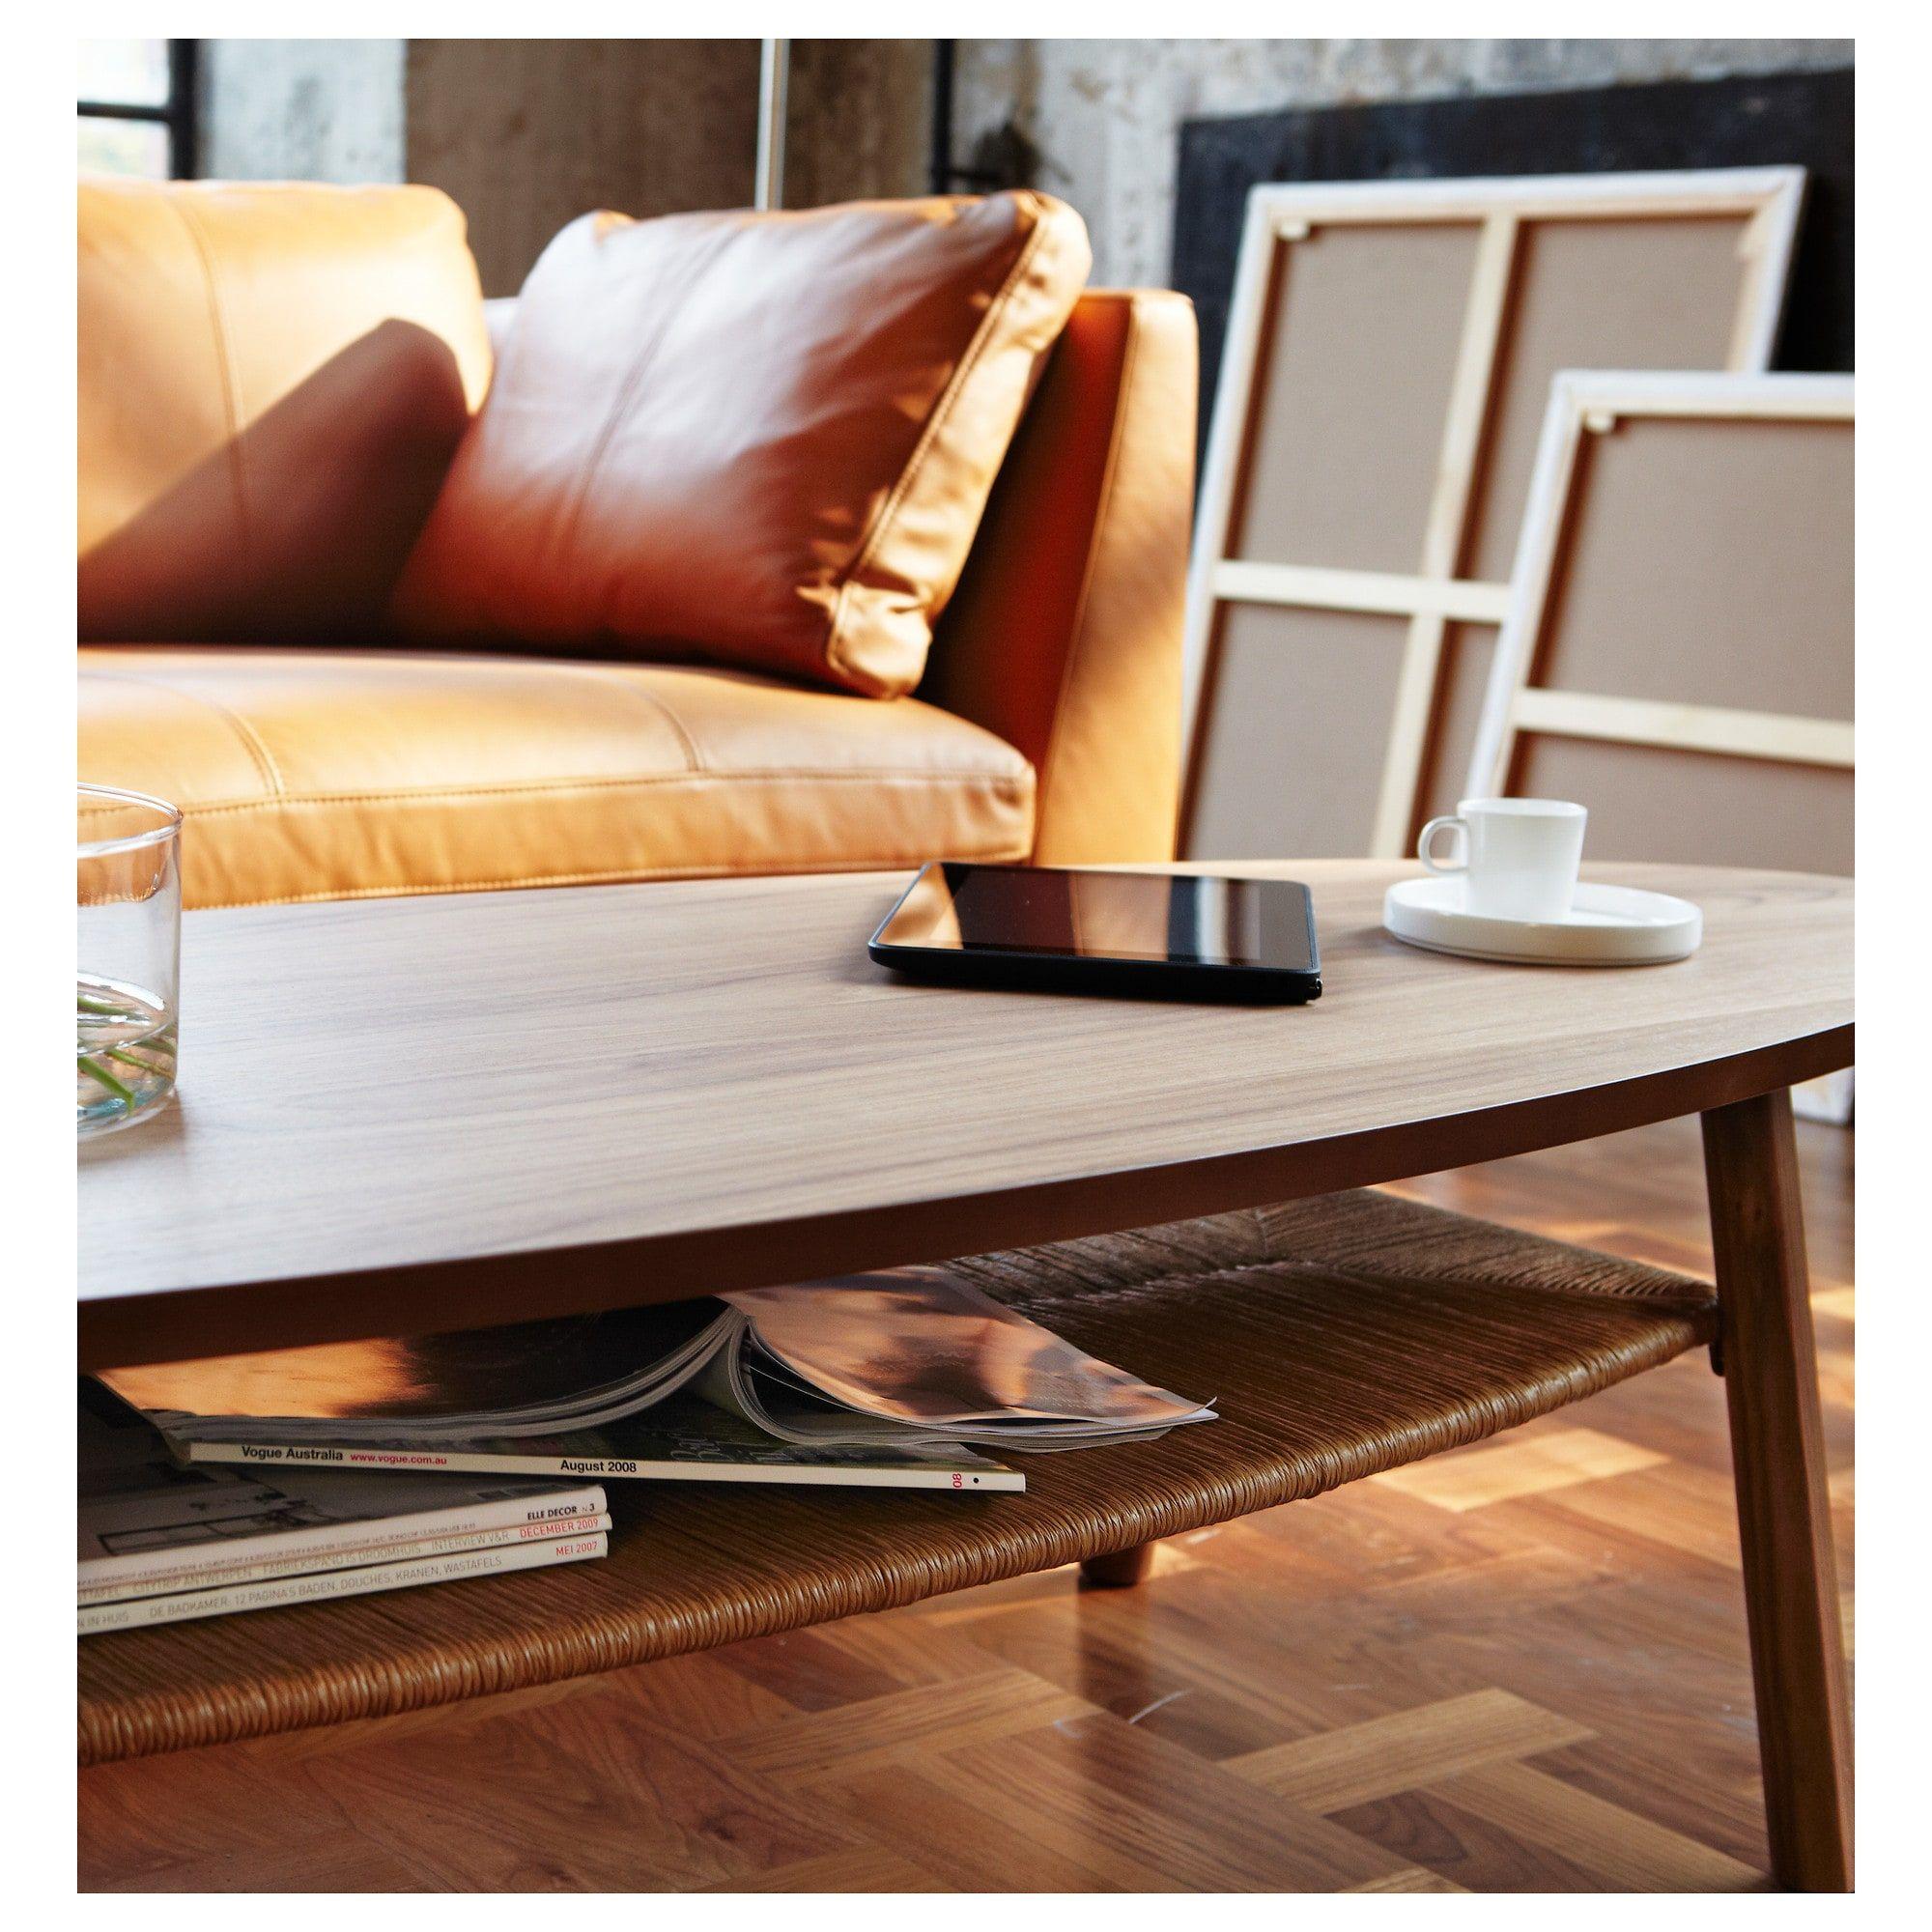 Ikea Stockholm Walnut Veneer Coffee Table Ikea Stockholm Walnut Coffee Table Ikea Coffee Table [ 2000 x 2000 Pixel ]